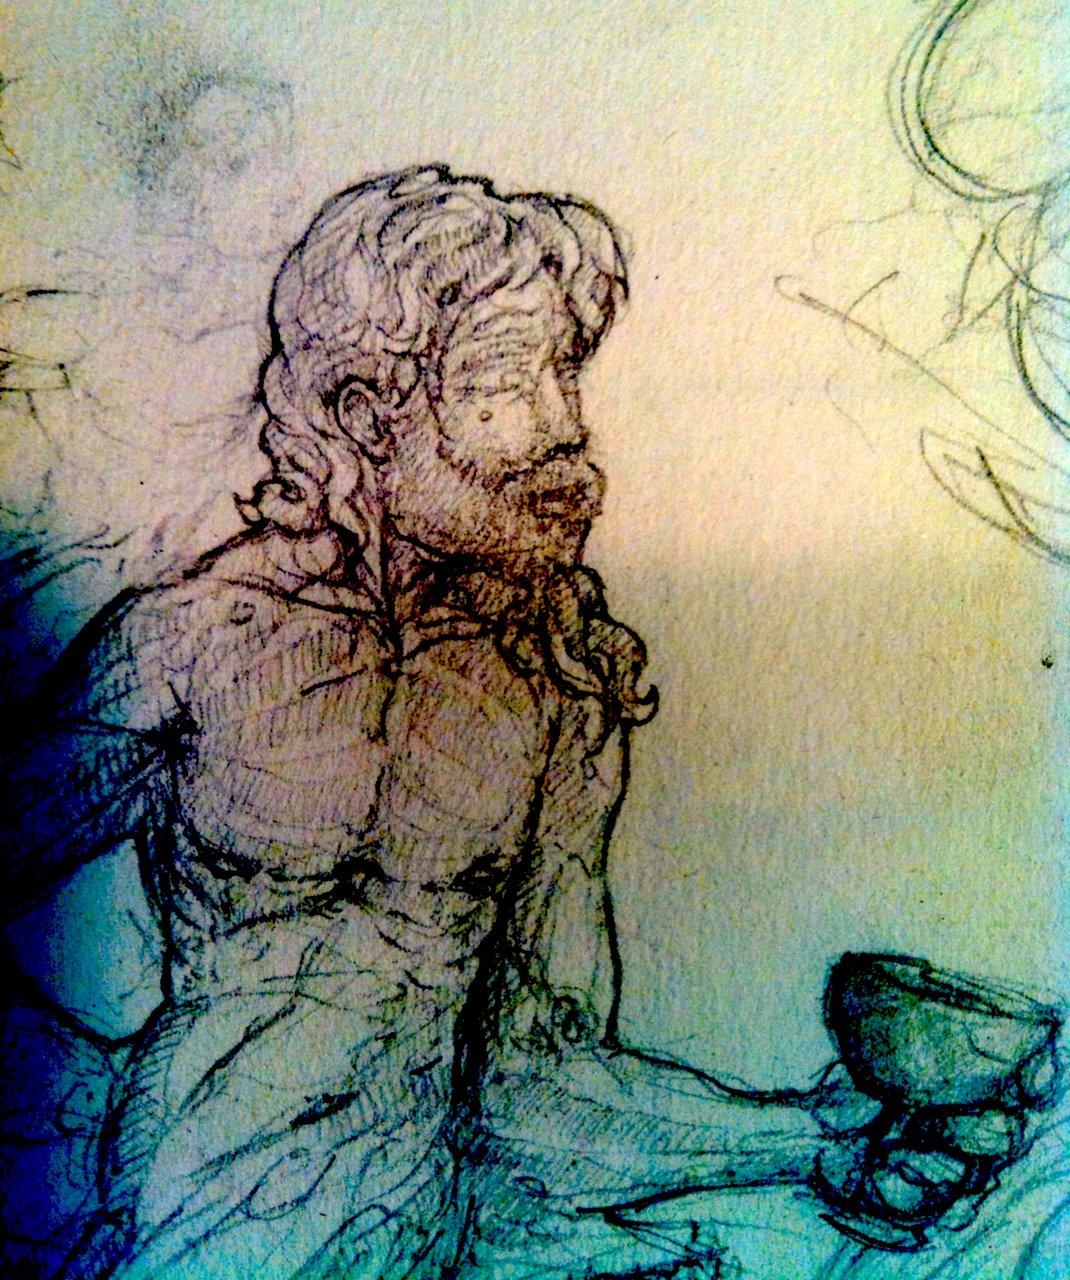 Bacchus sketch detail